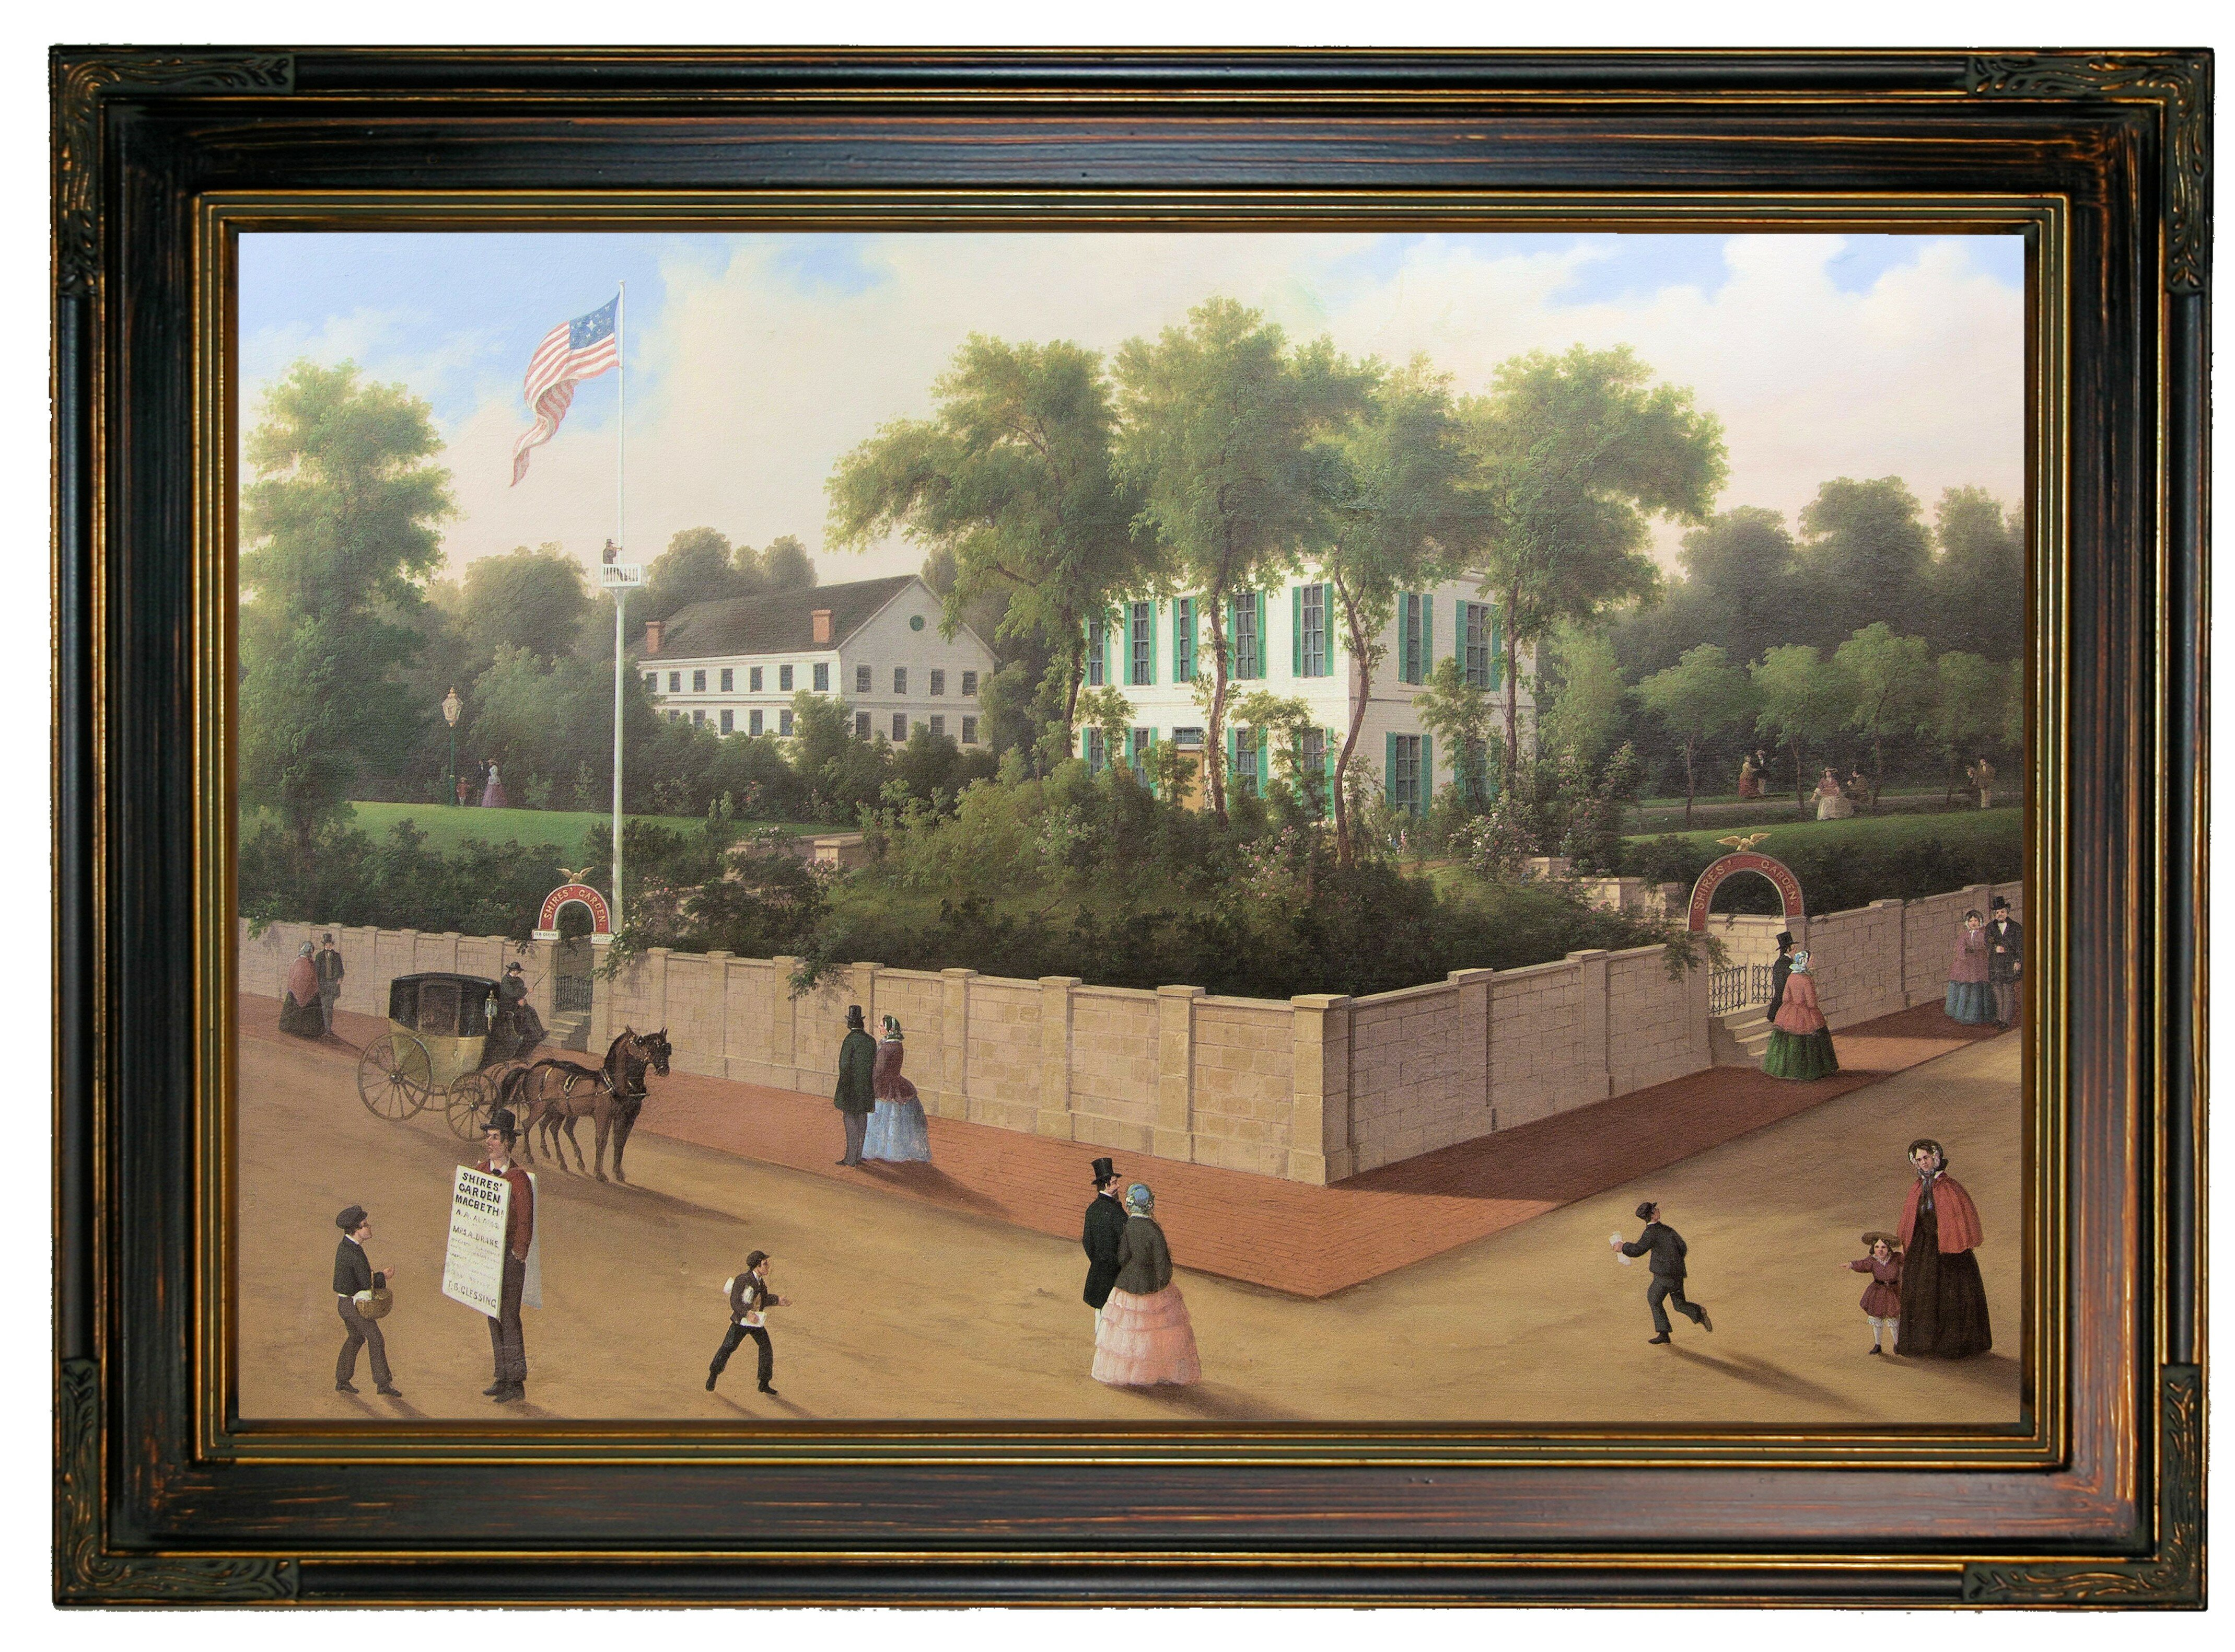 Historic Art Gallery Shires Garden